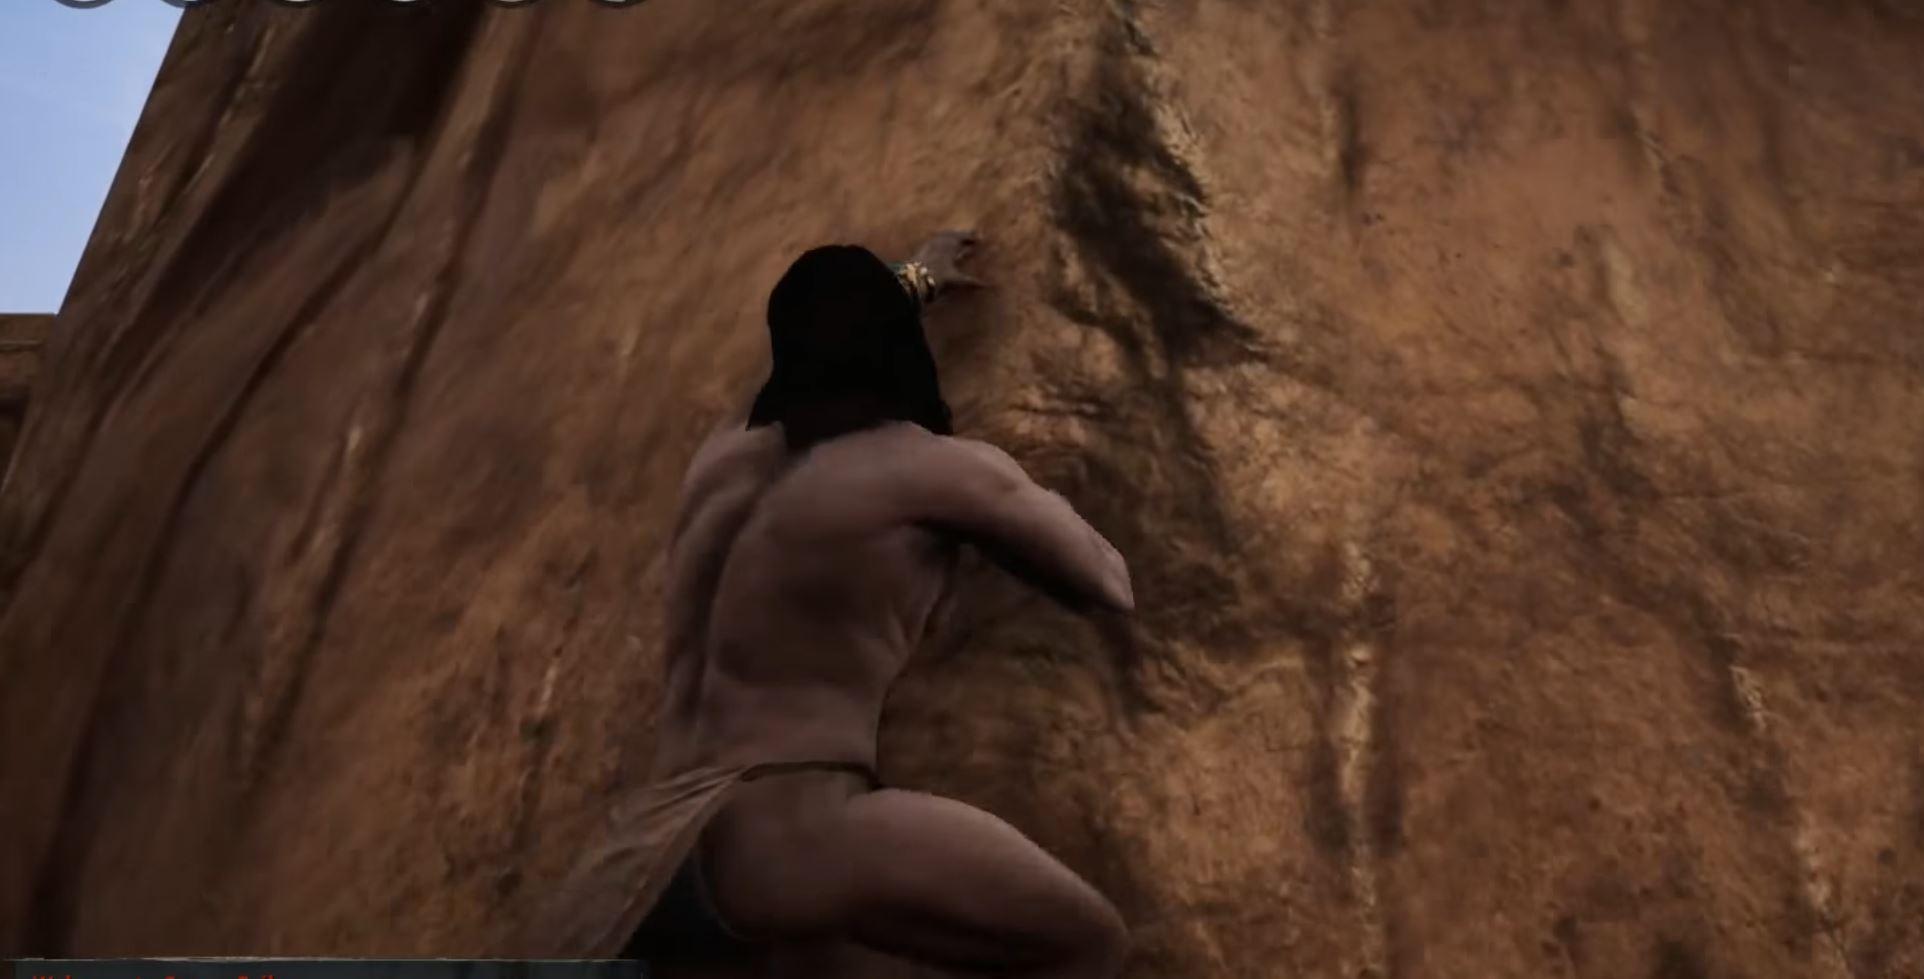 Conan Exiles: Kletter-Feature – Barbaren entdecken Parcours